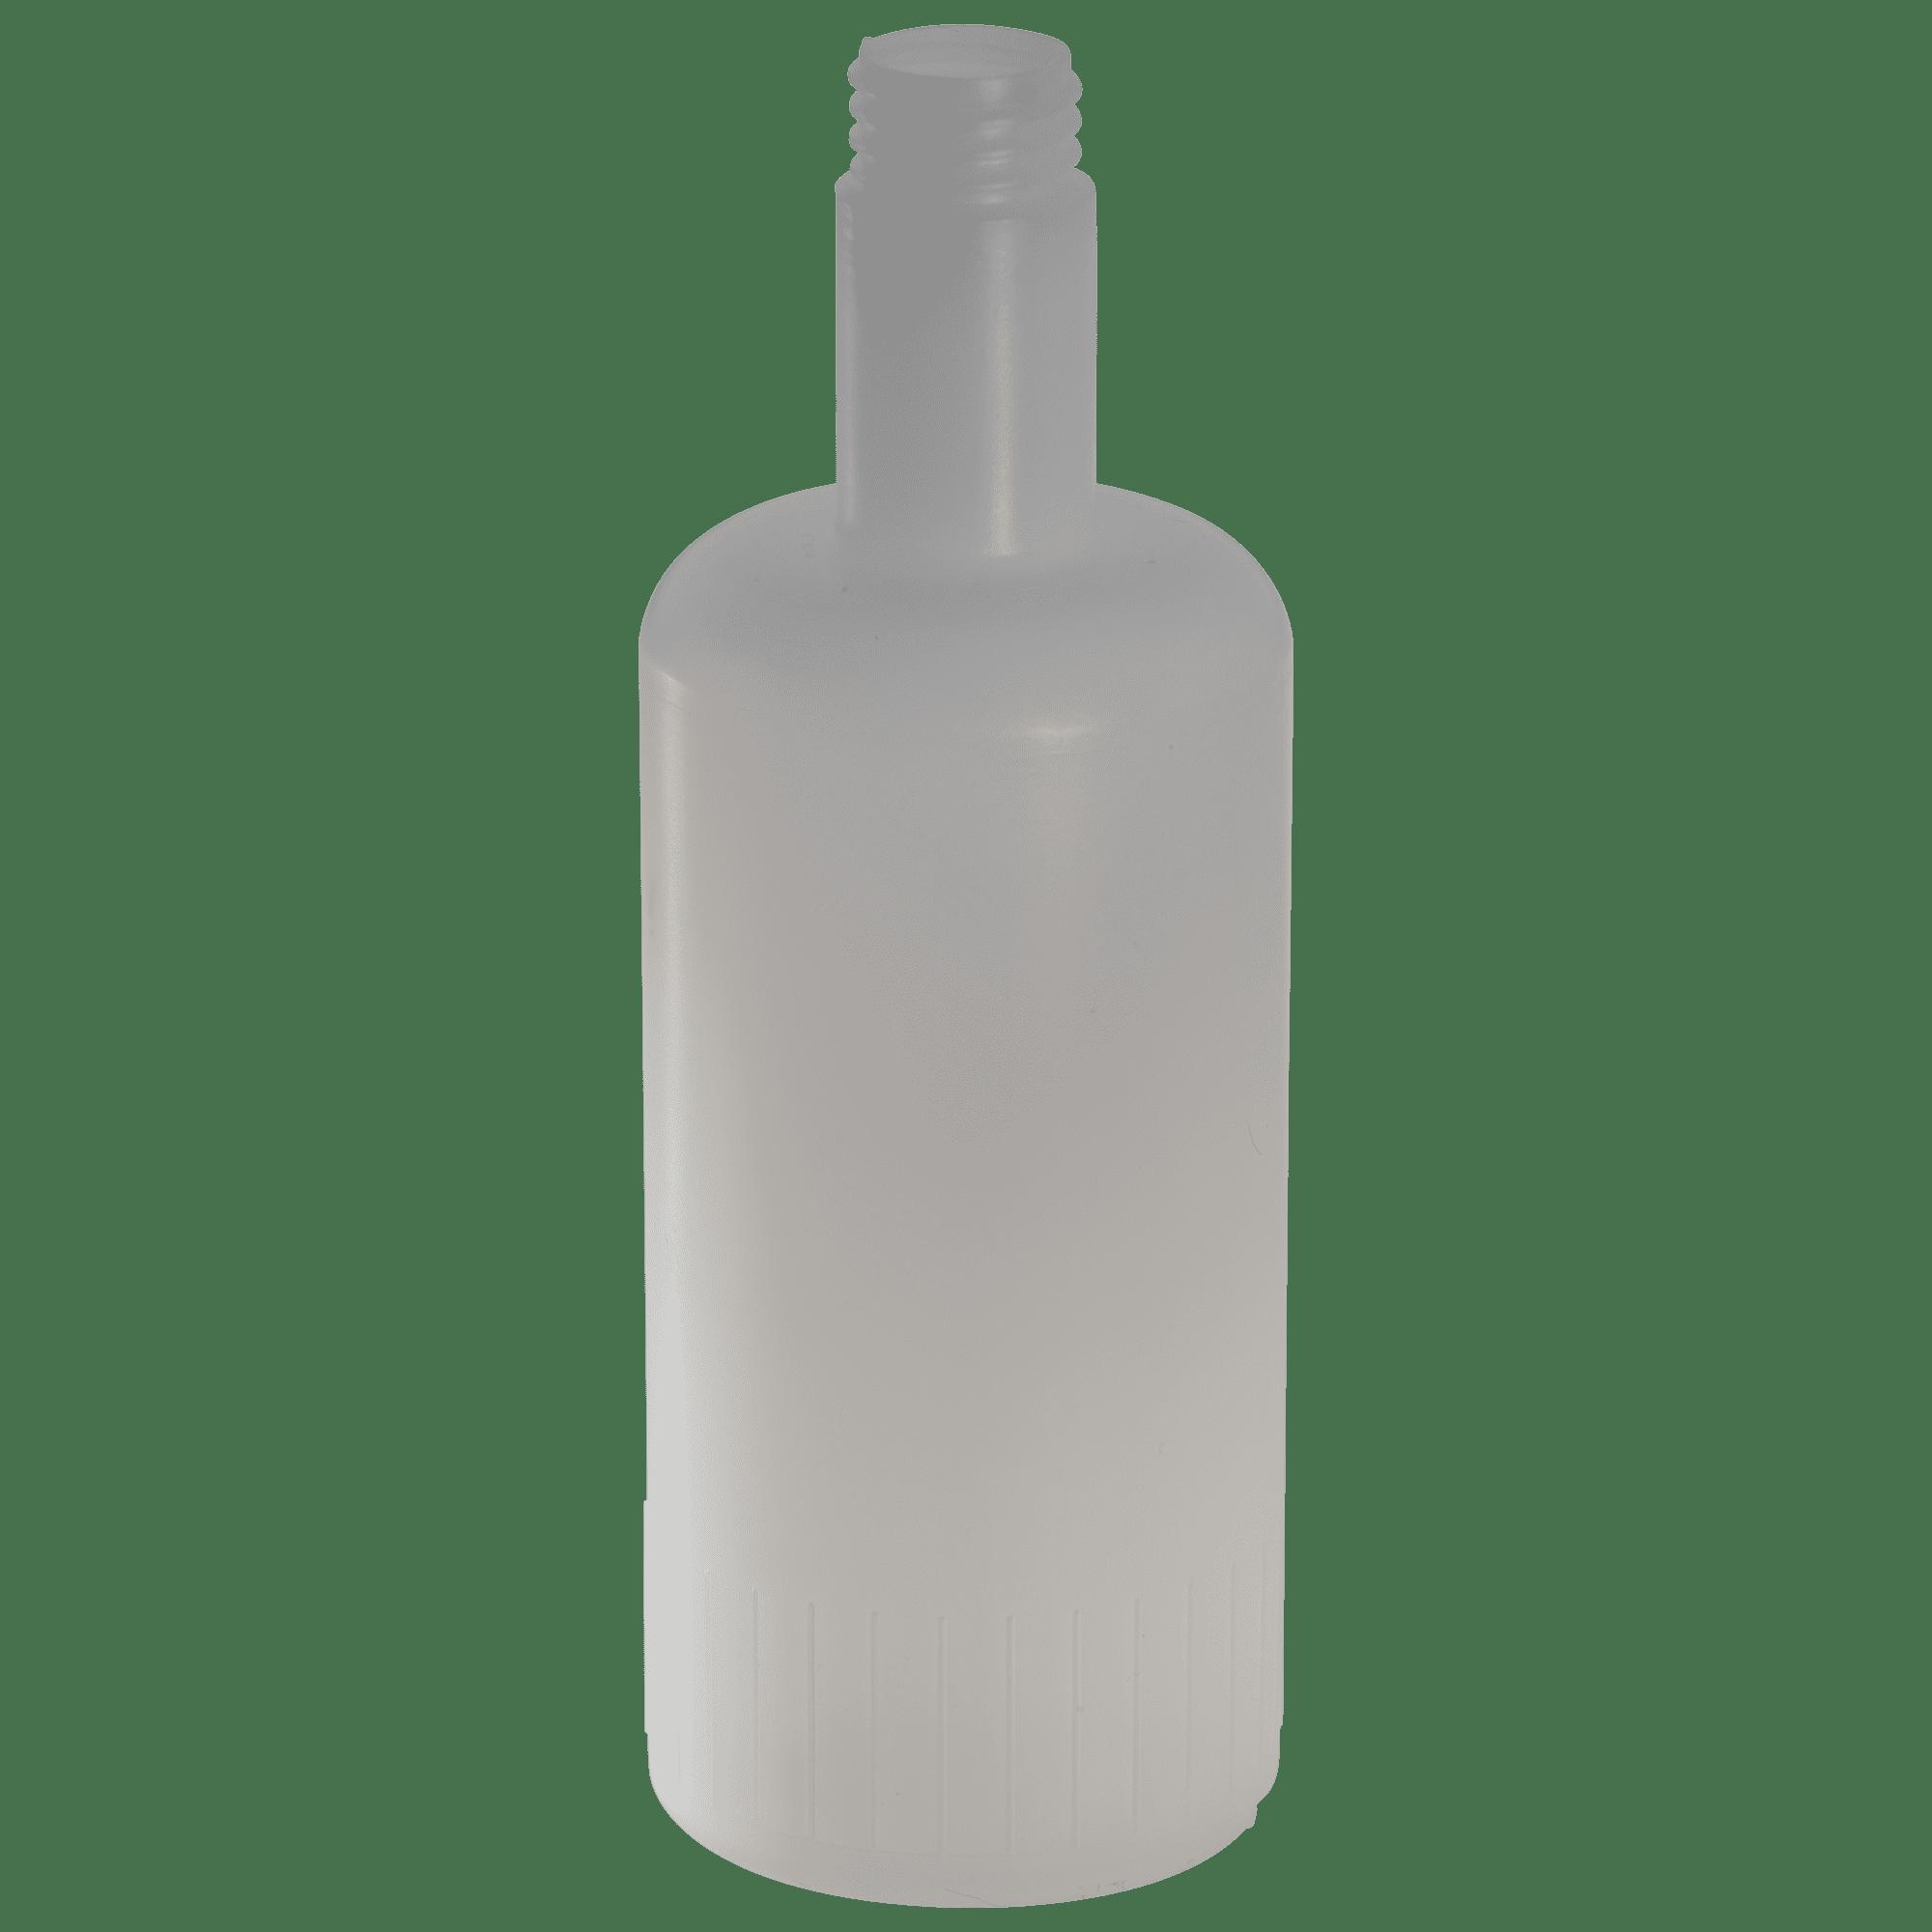 Delta Soap Lotion Dispenser Bottle Rp21904 Walmart Com Walmart Com